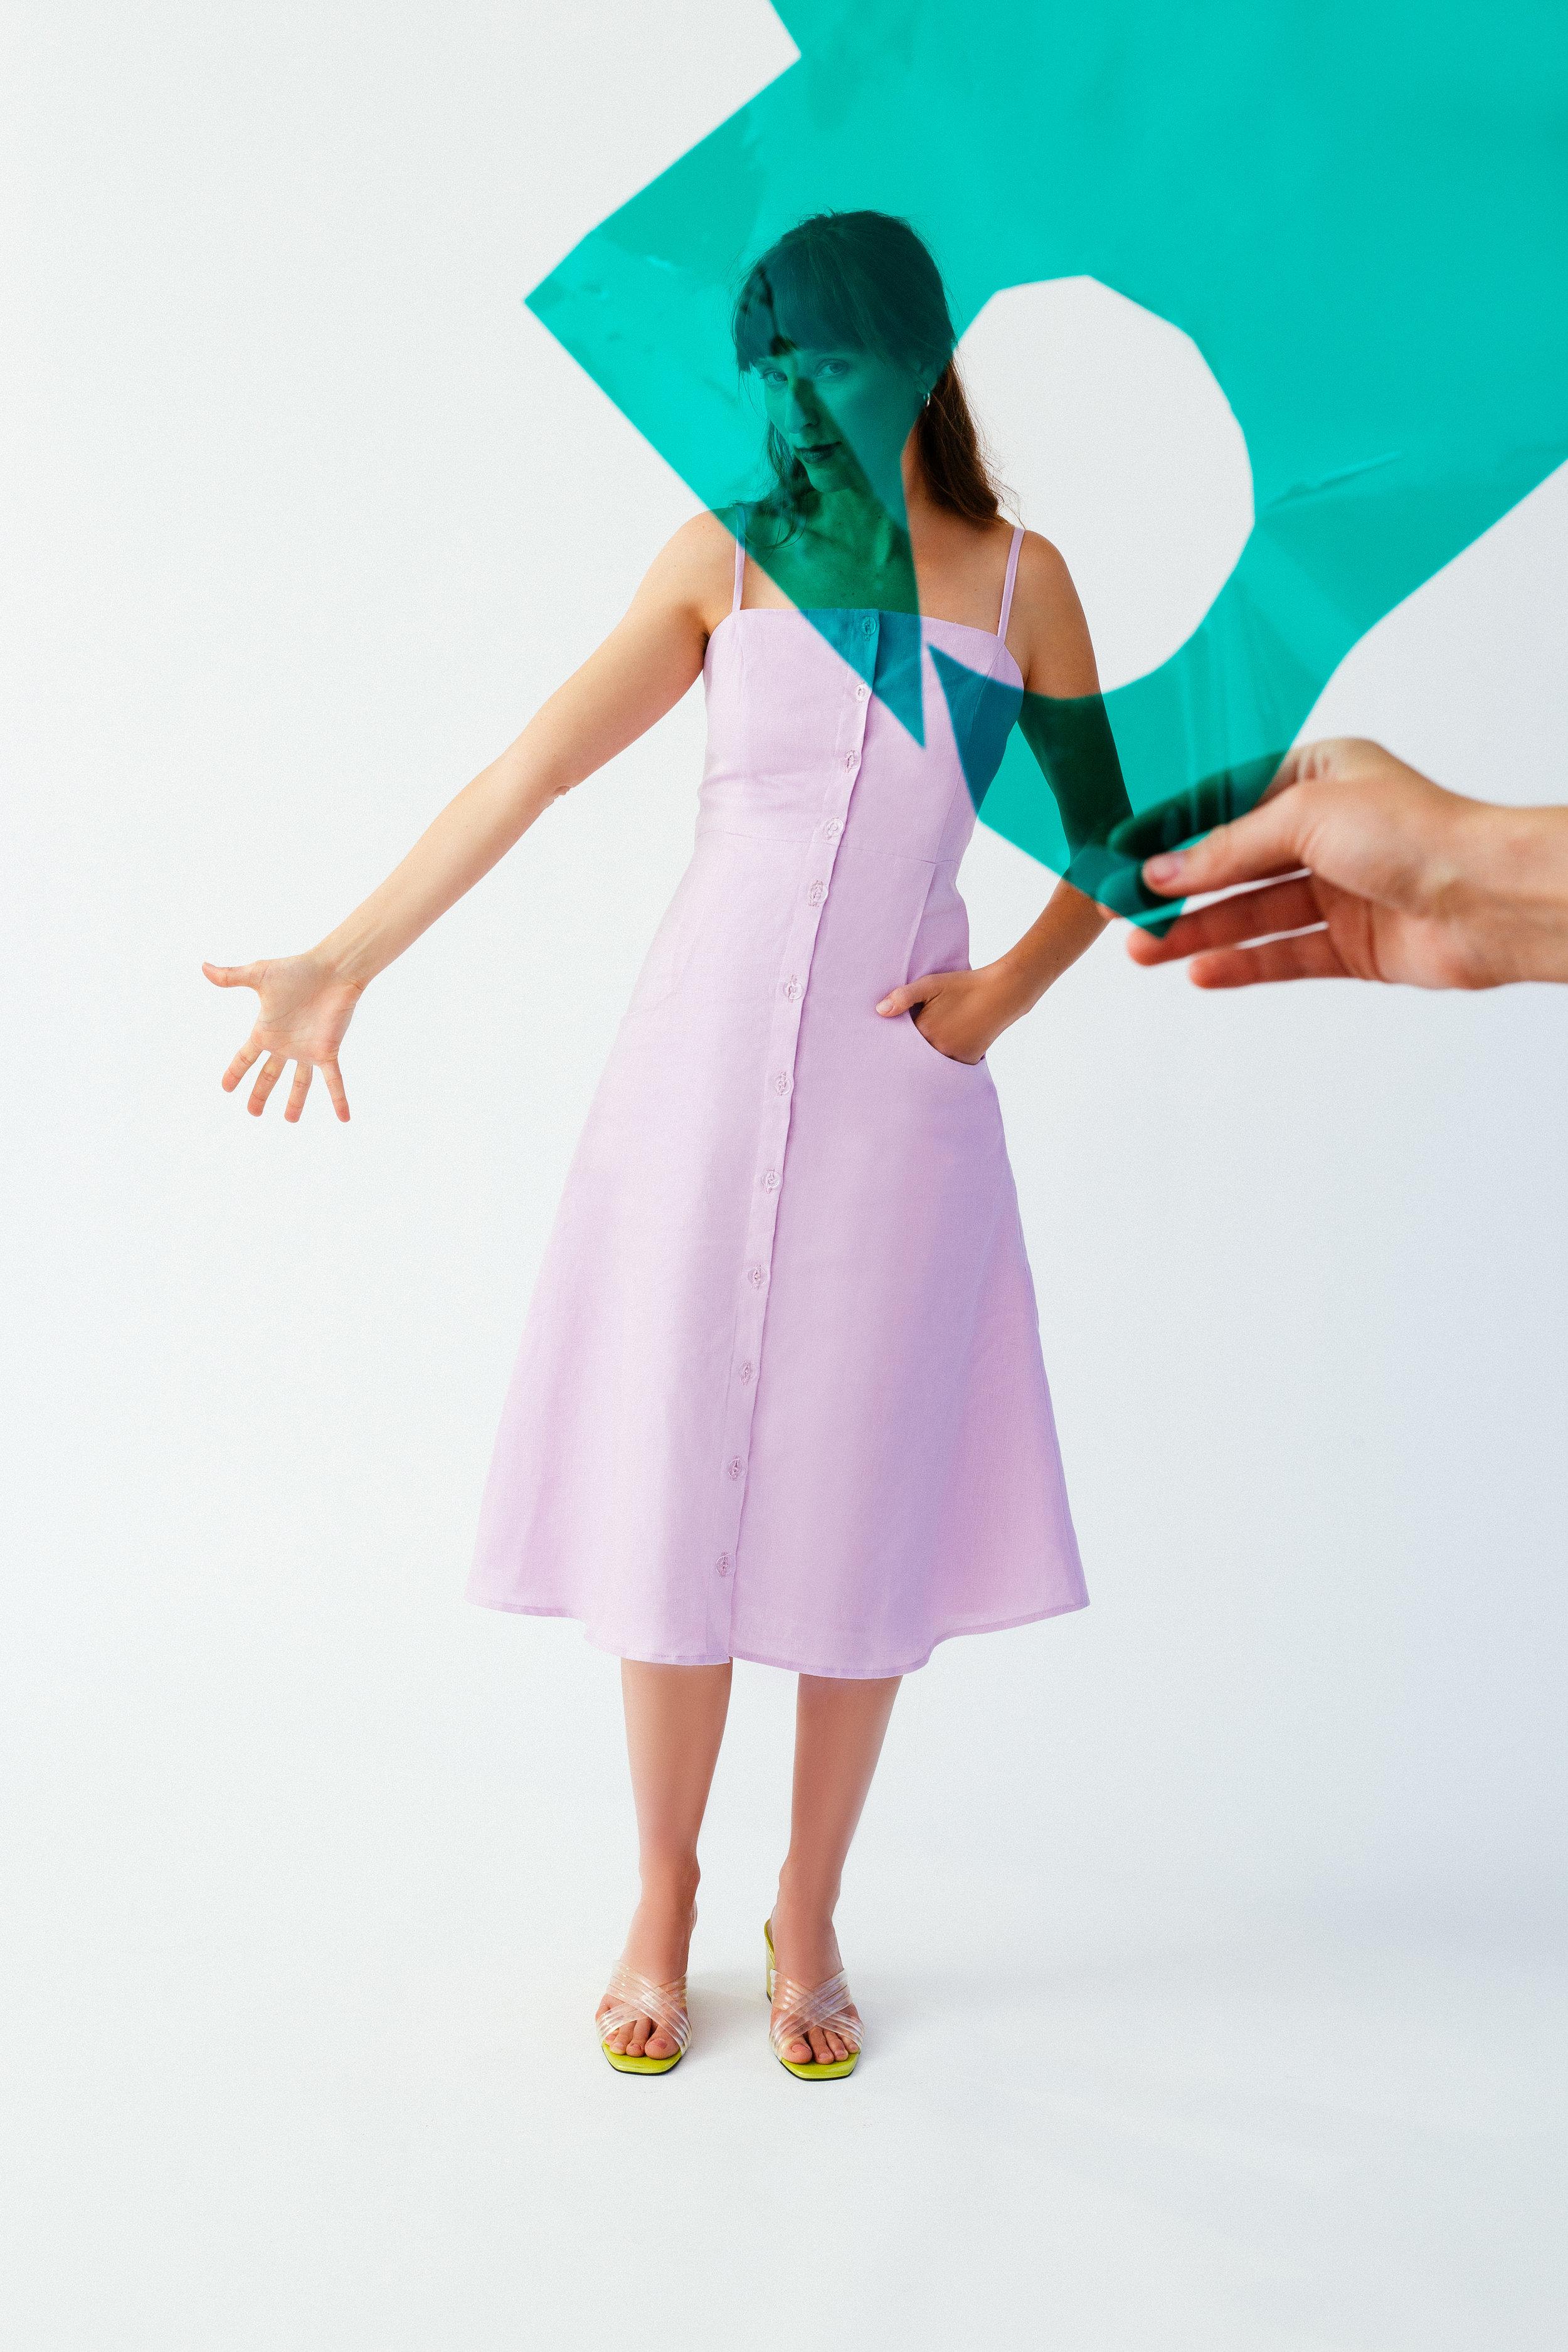 ellice ruiz_sustainable workwear_fashion.jpg